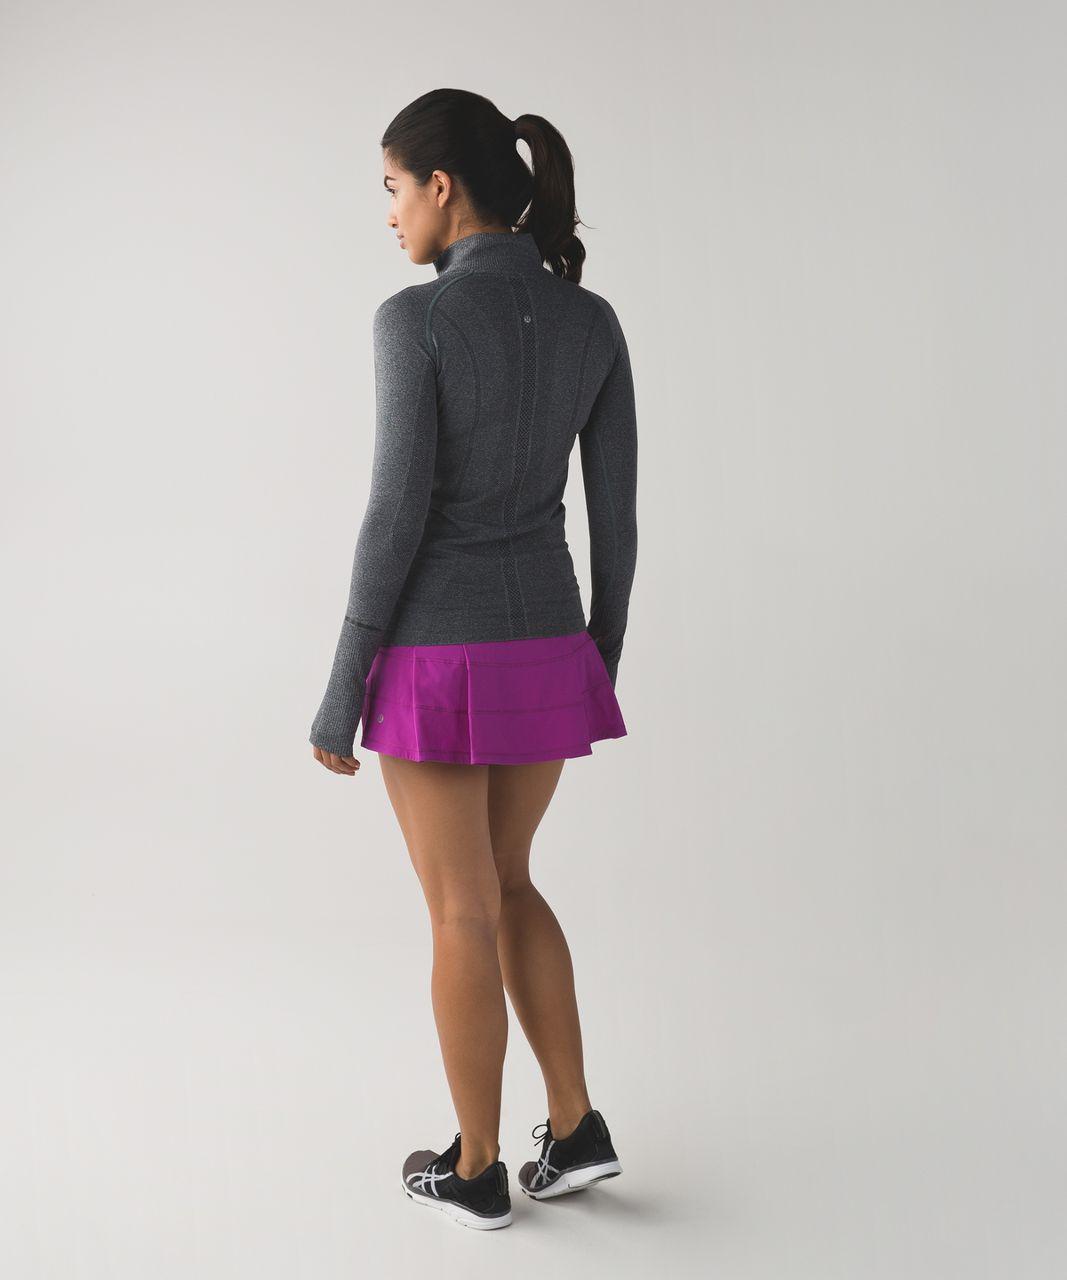 Lululemon Pace Rival Skirt II (Regular) *4-way Stretch - Ultra Violet / Space Dye Twist Ultra Violet Multi